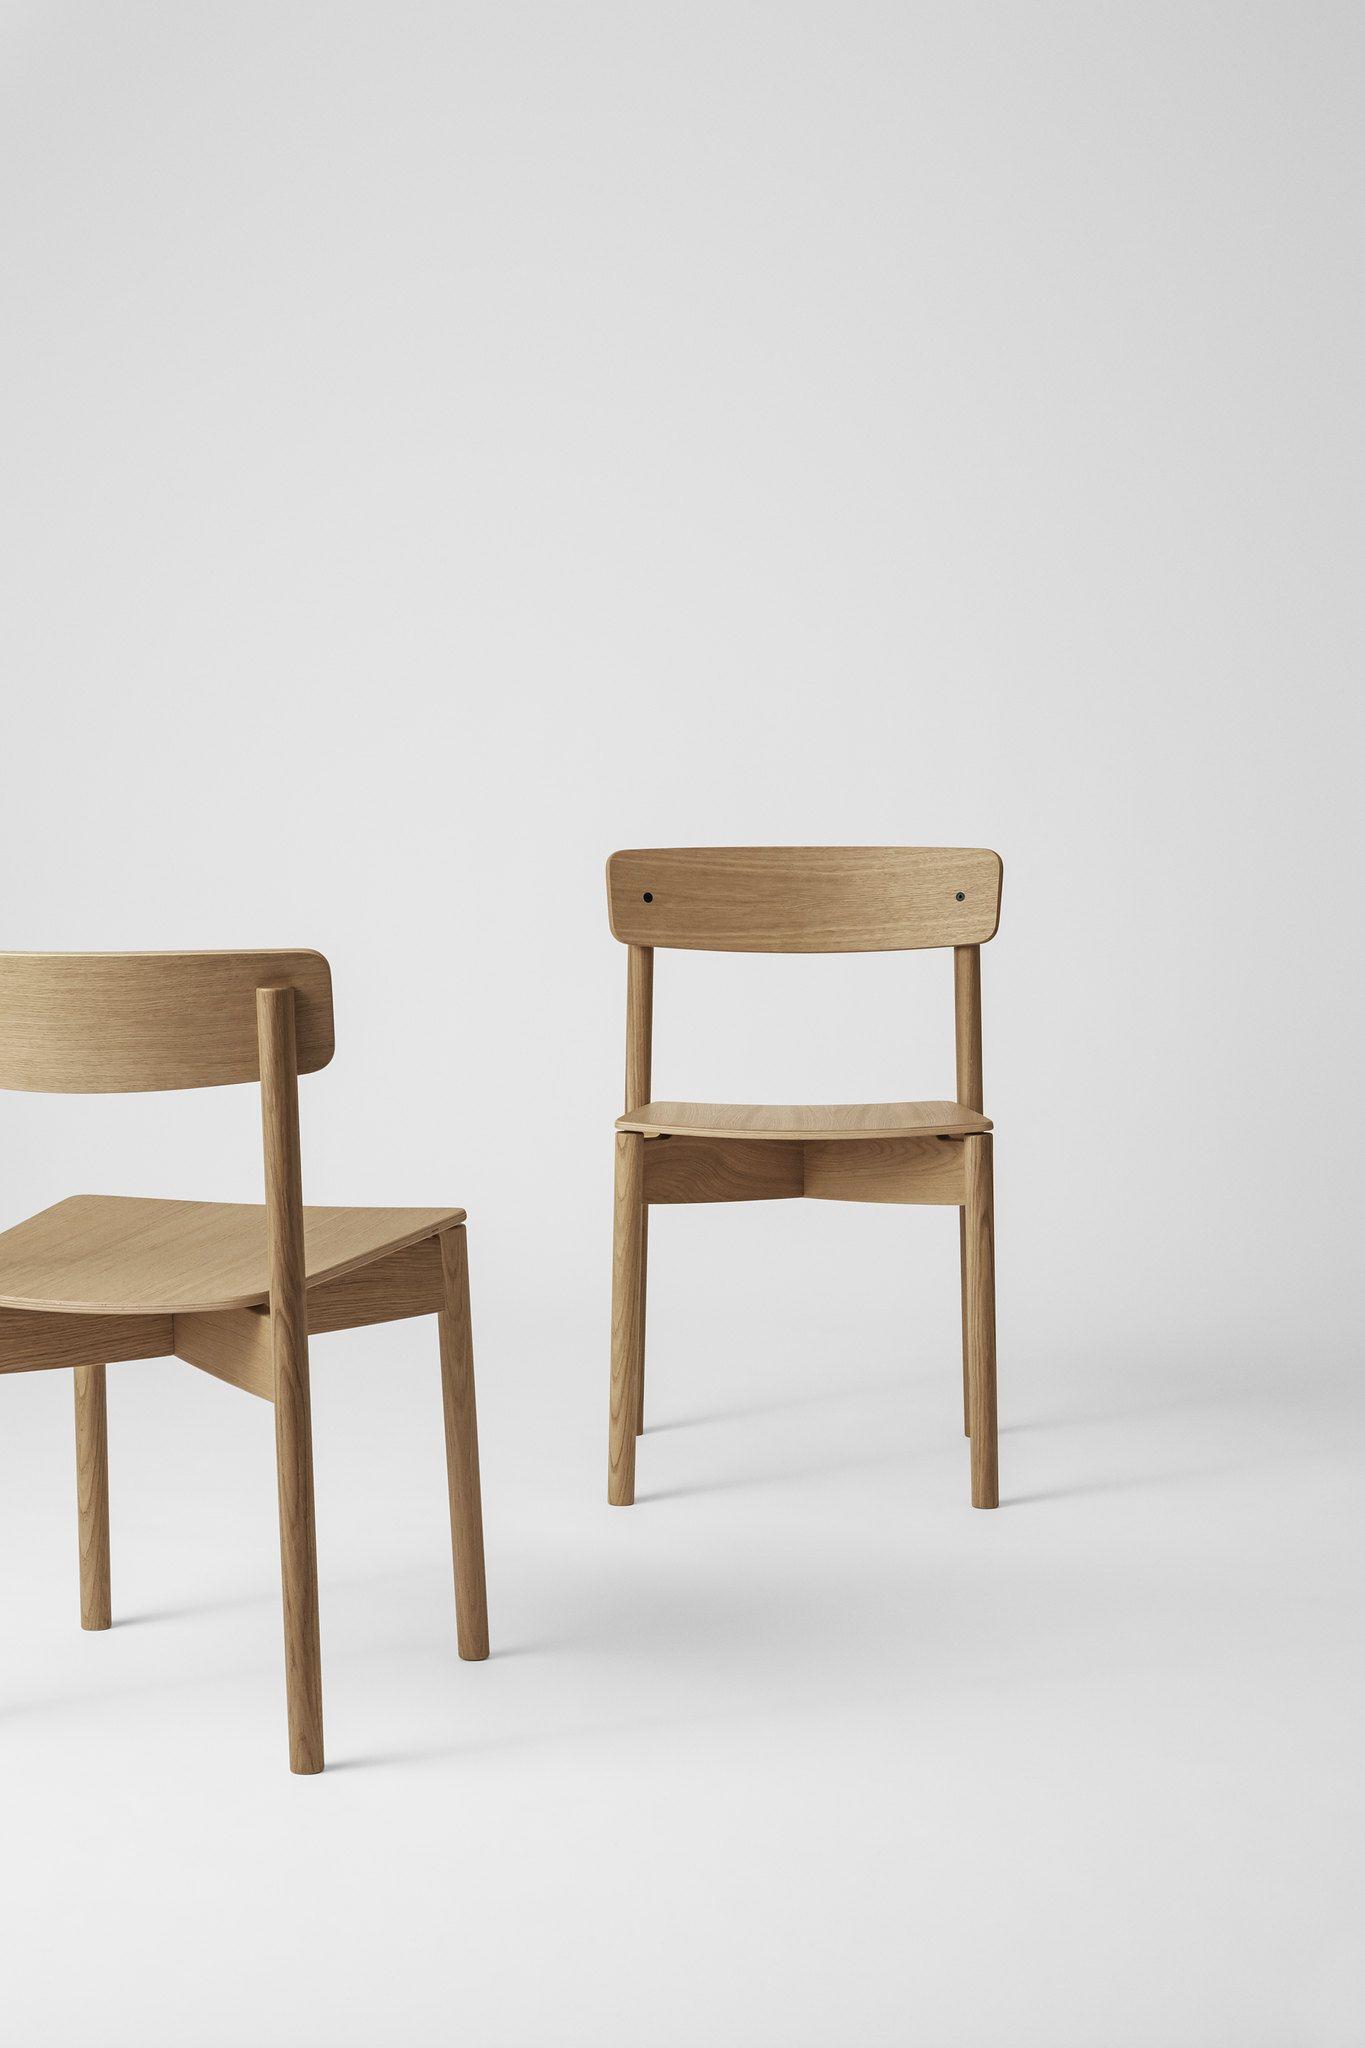 T01 Cross Chair Minimalist Chair Chair Design Outdoor Furniture Design